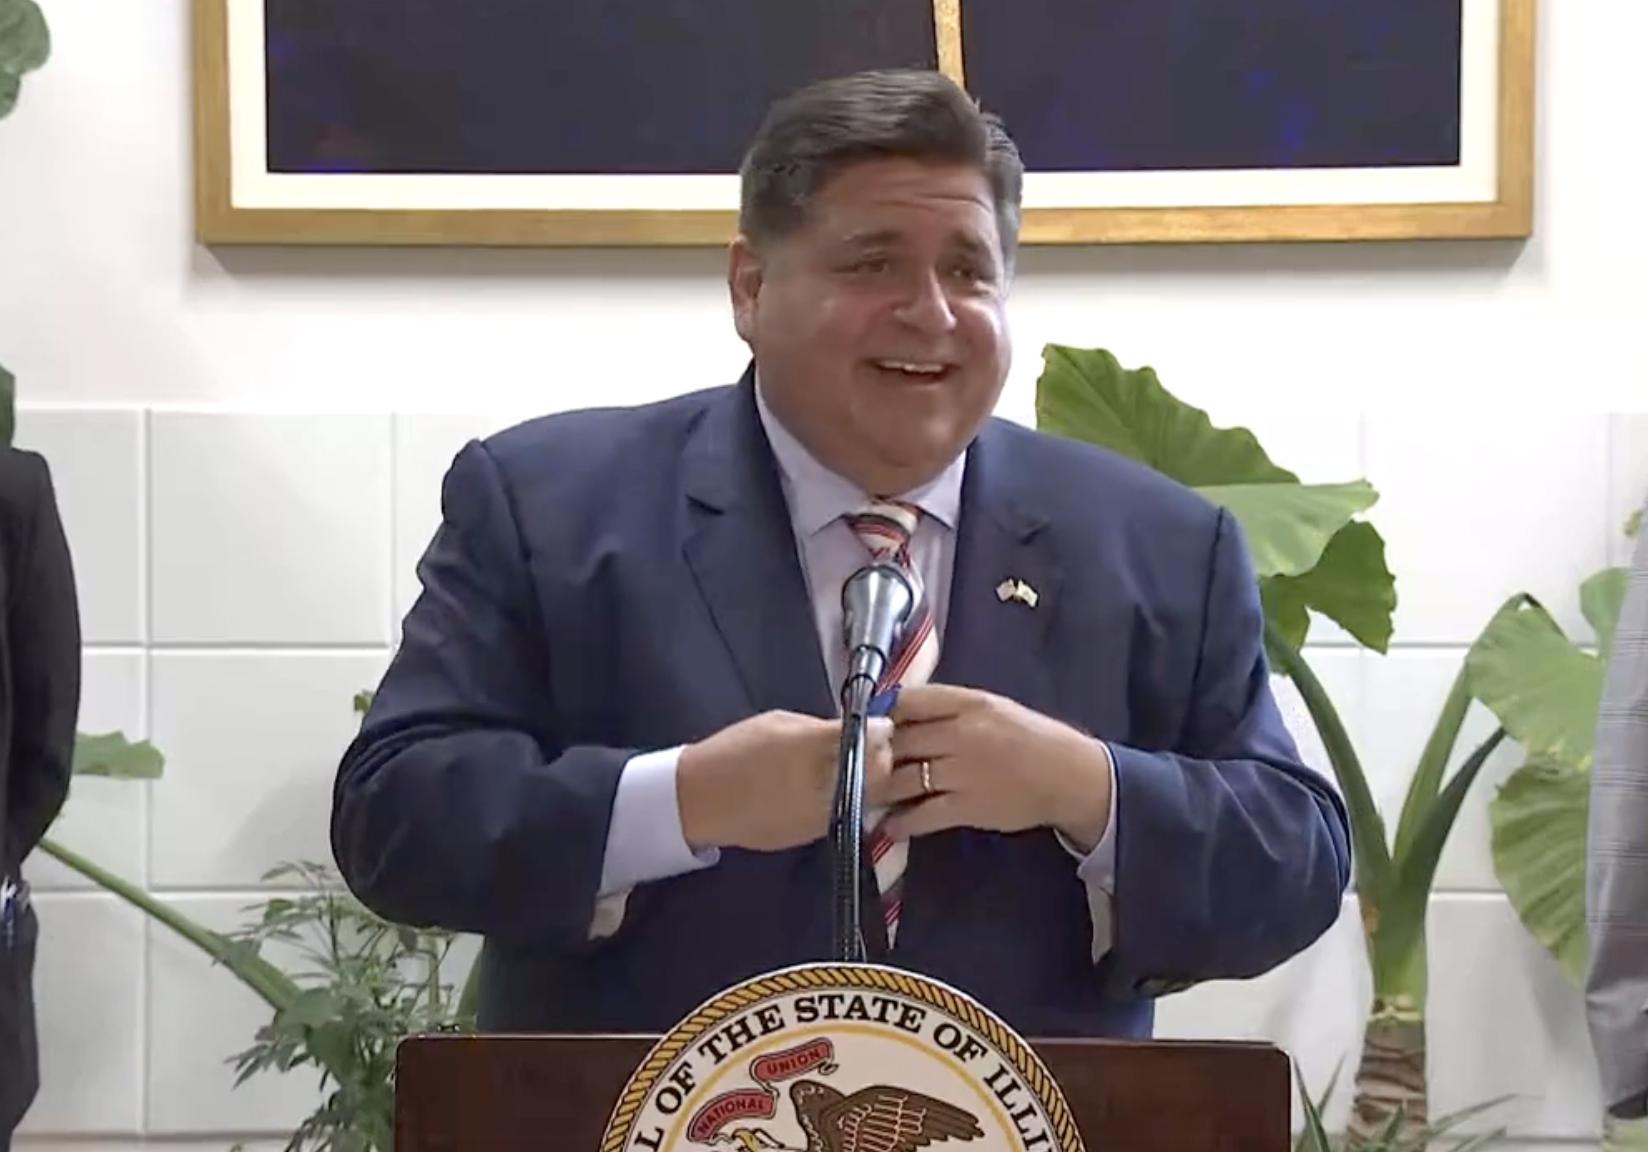 Gov. J.B. Pritzker announces $16.5 million in grants for economic development on Tuesday.